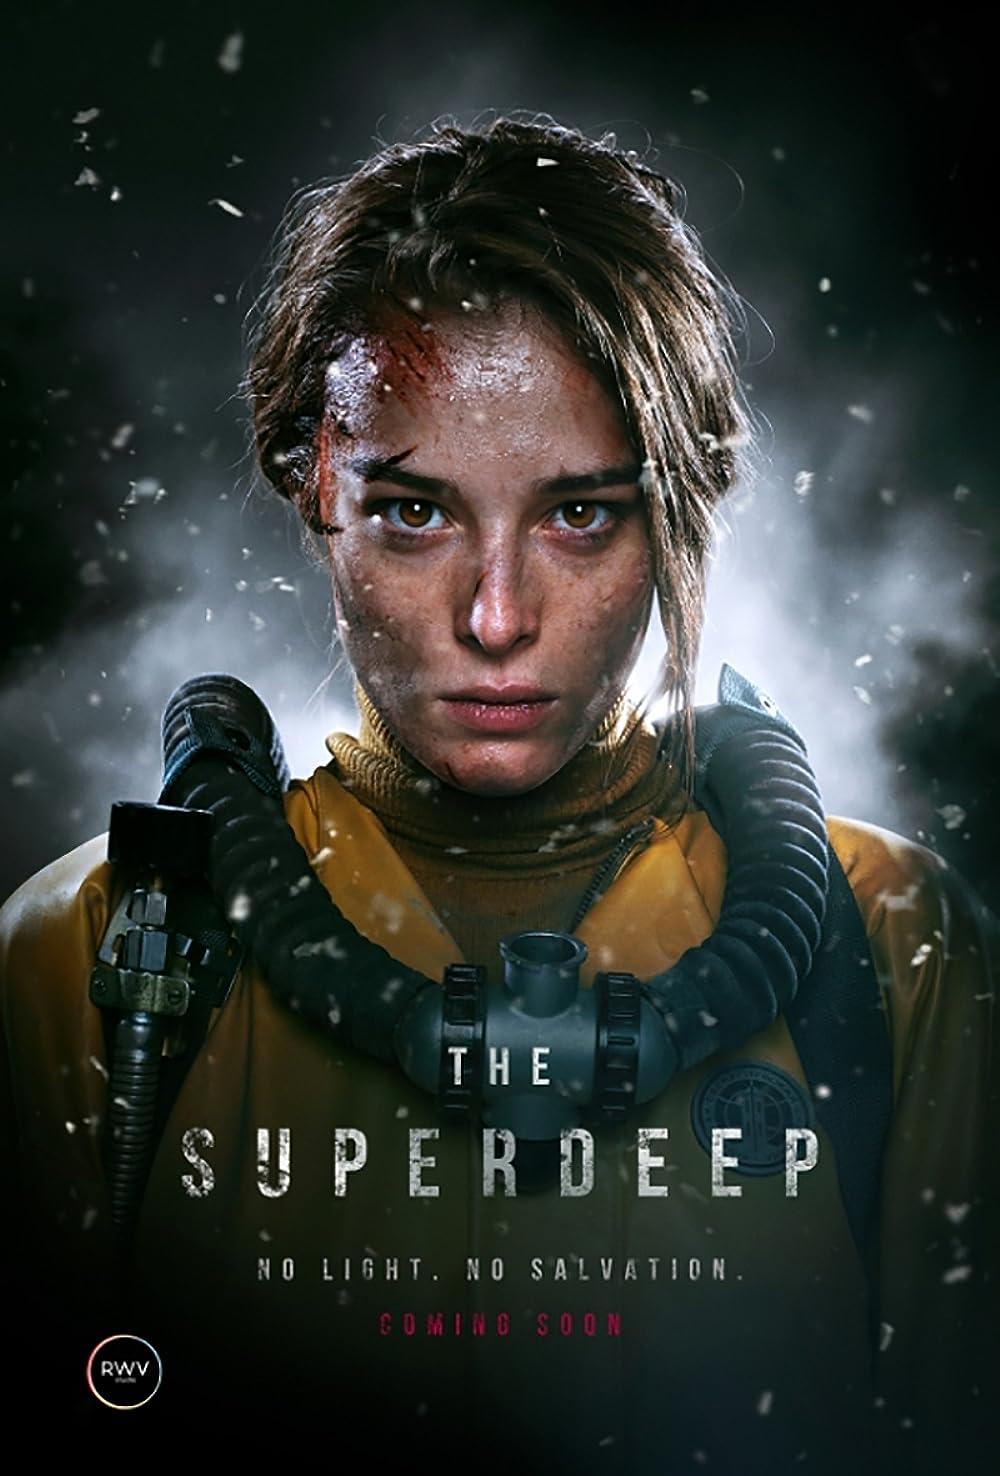 Superdeep (2020) Hindi (Voice Over) Dubbed+ English [Dual Audio] WebRip 720p [1XBET]